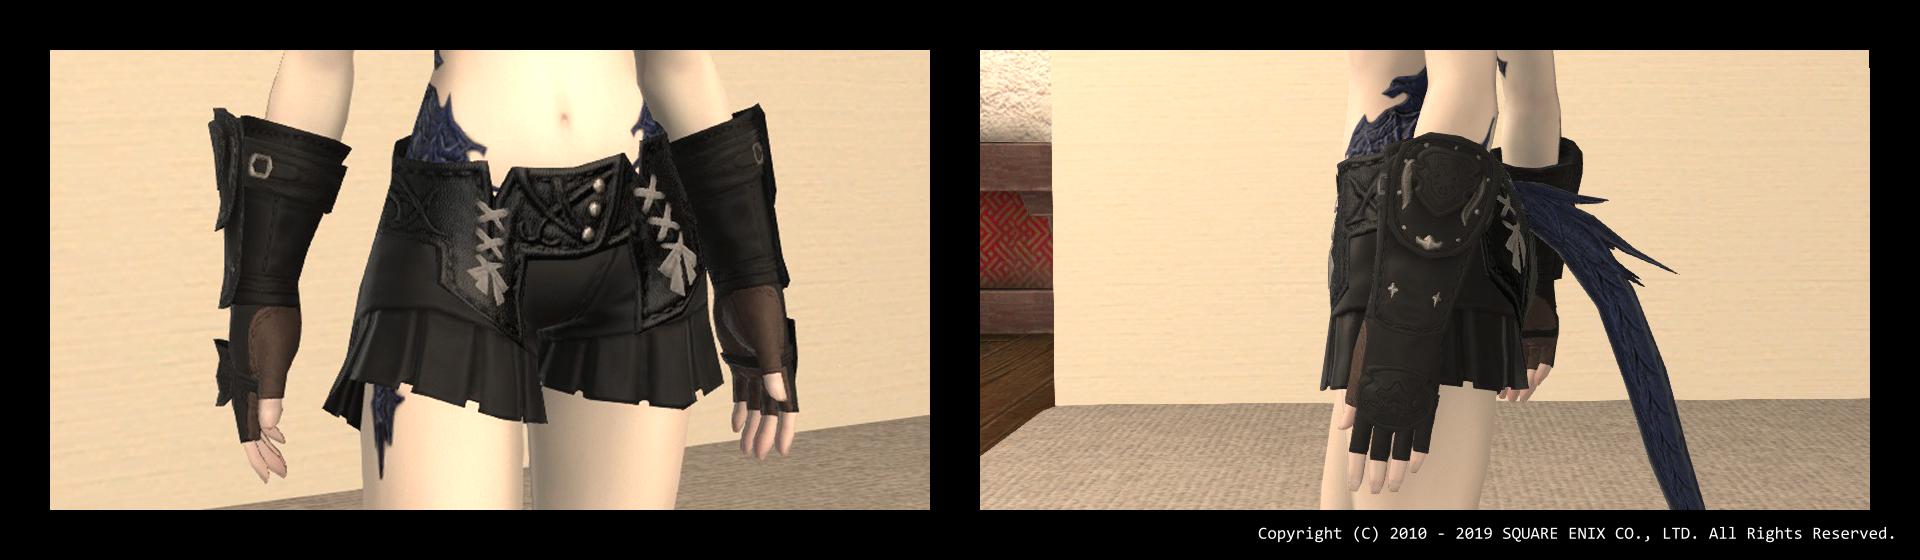 412-mnksam-hands